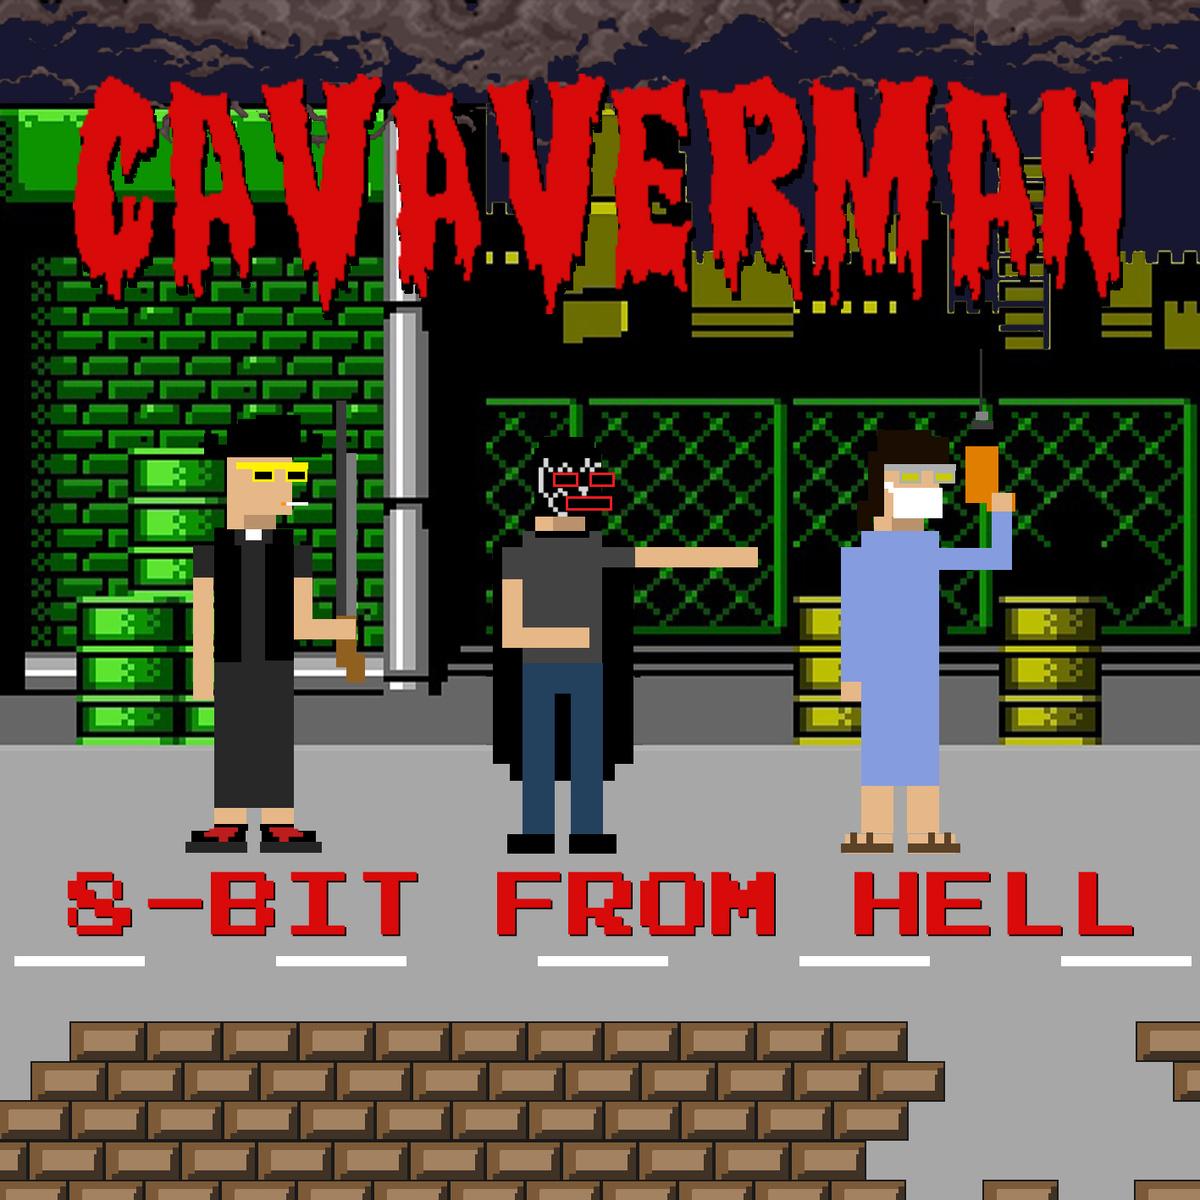 Cavaverman new free ep for X-Mas!